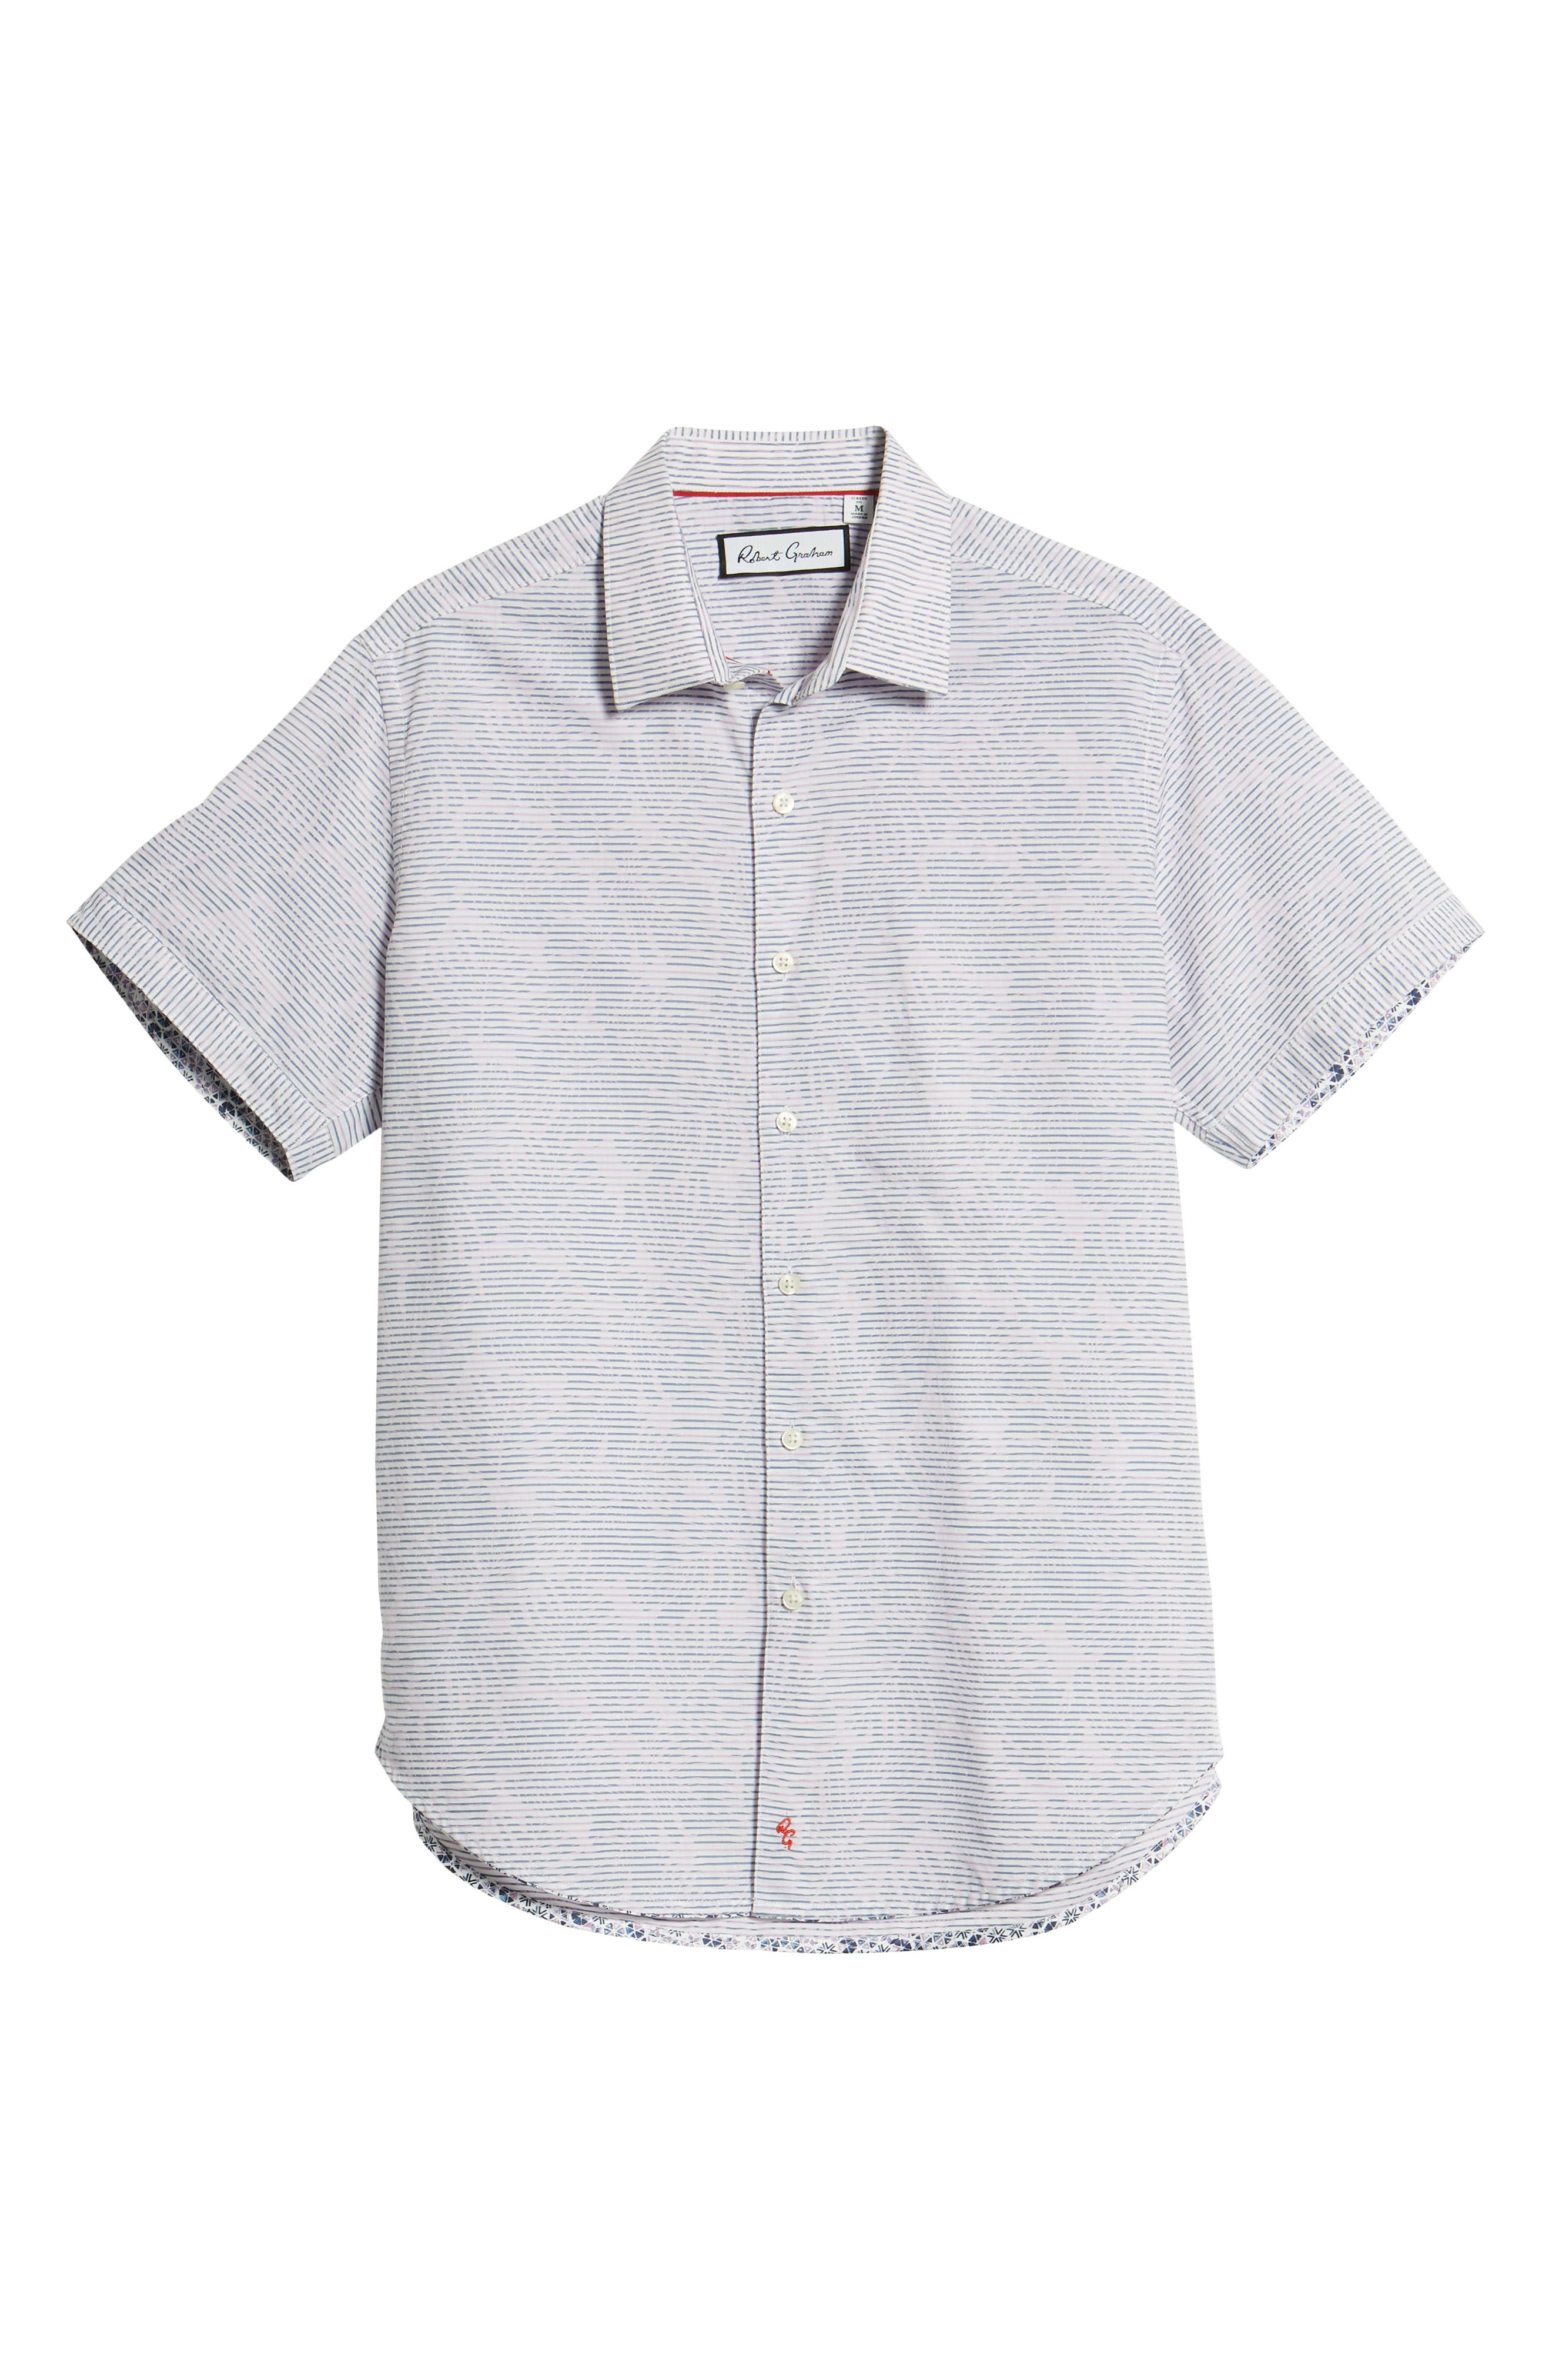 El Carmelo Classic Fit Sport Shirt,                             Alternate thumbnail 6, color,                             652